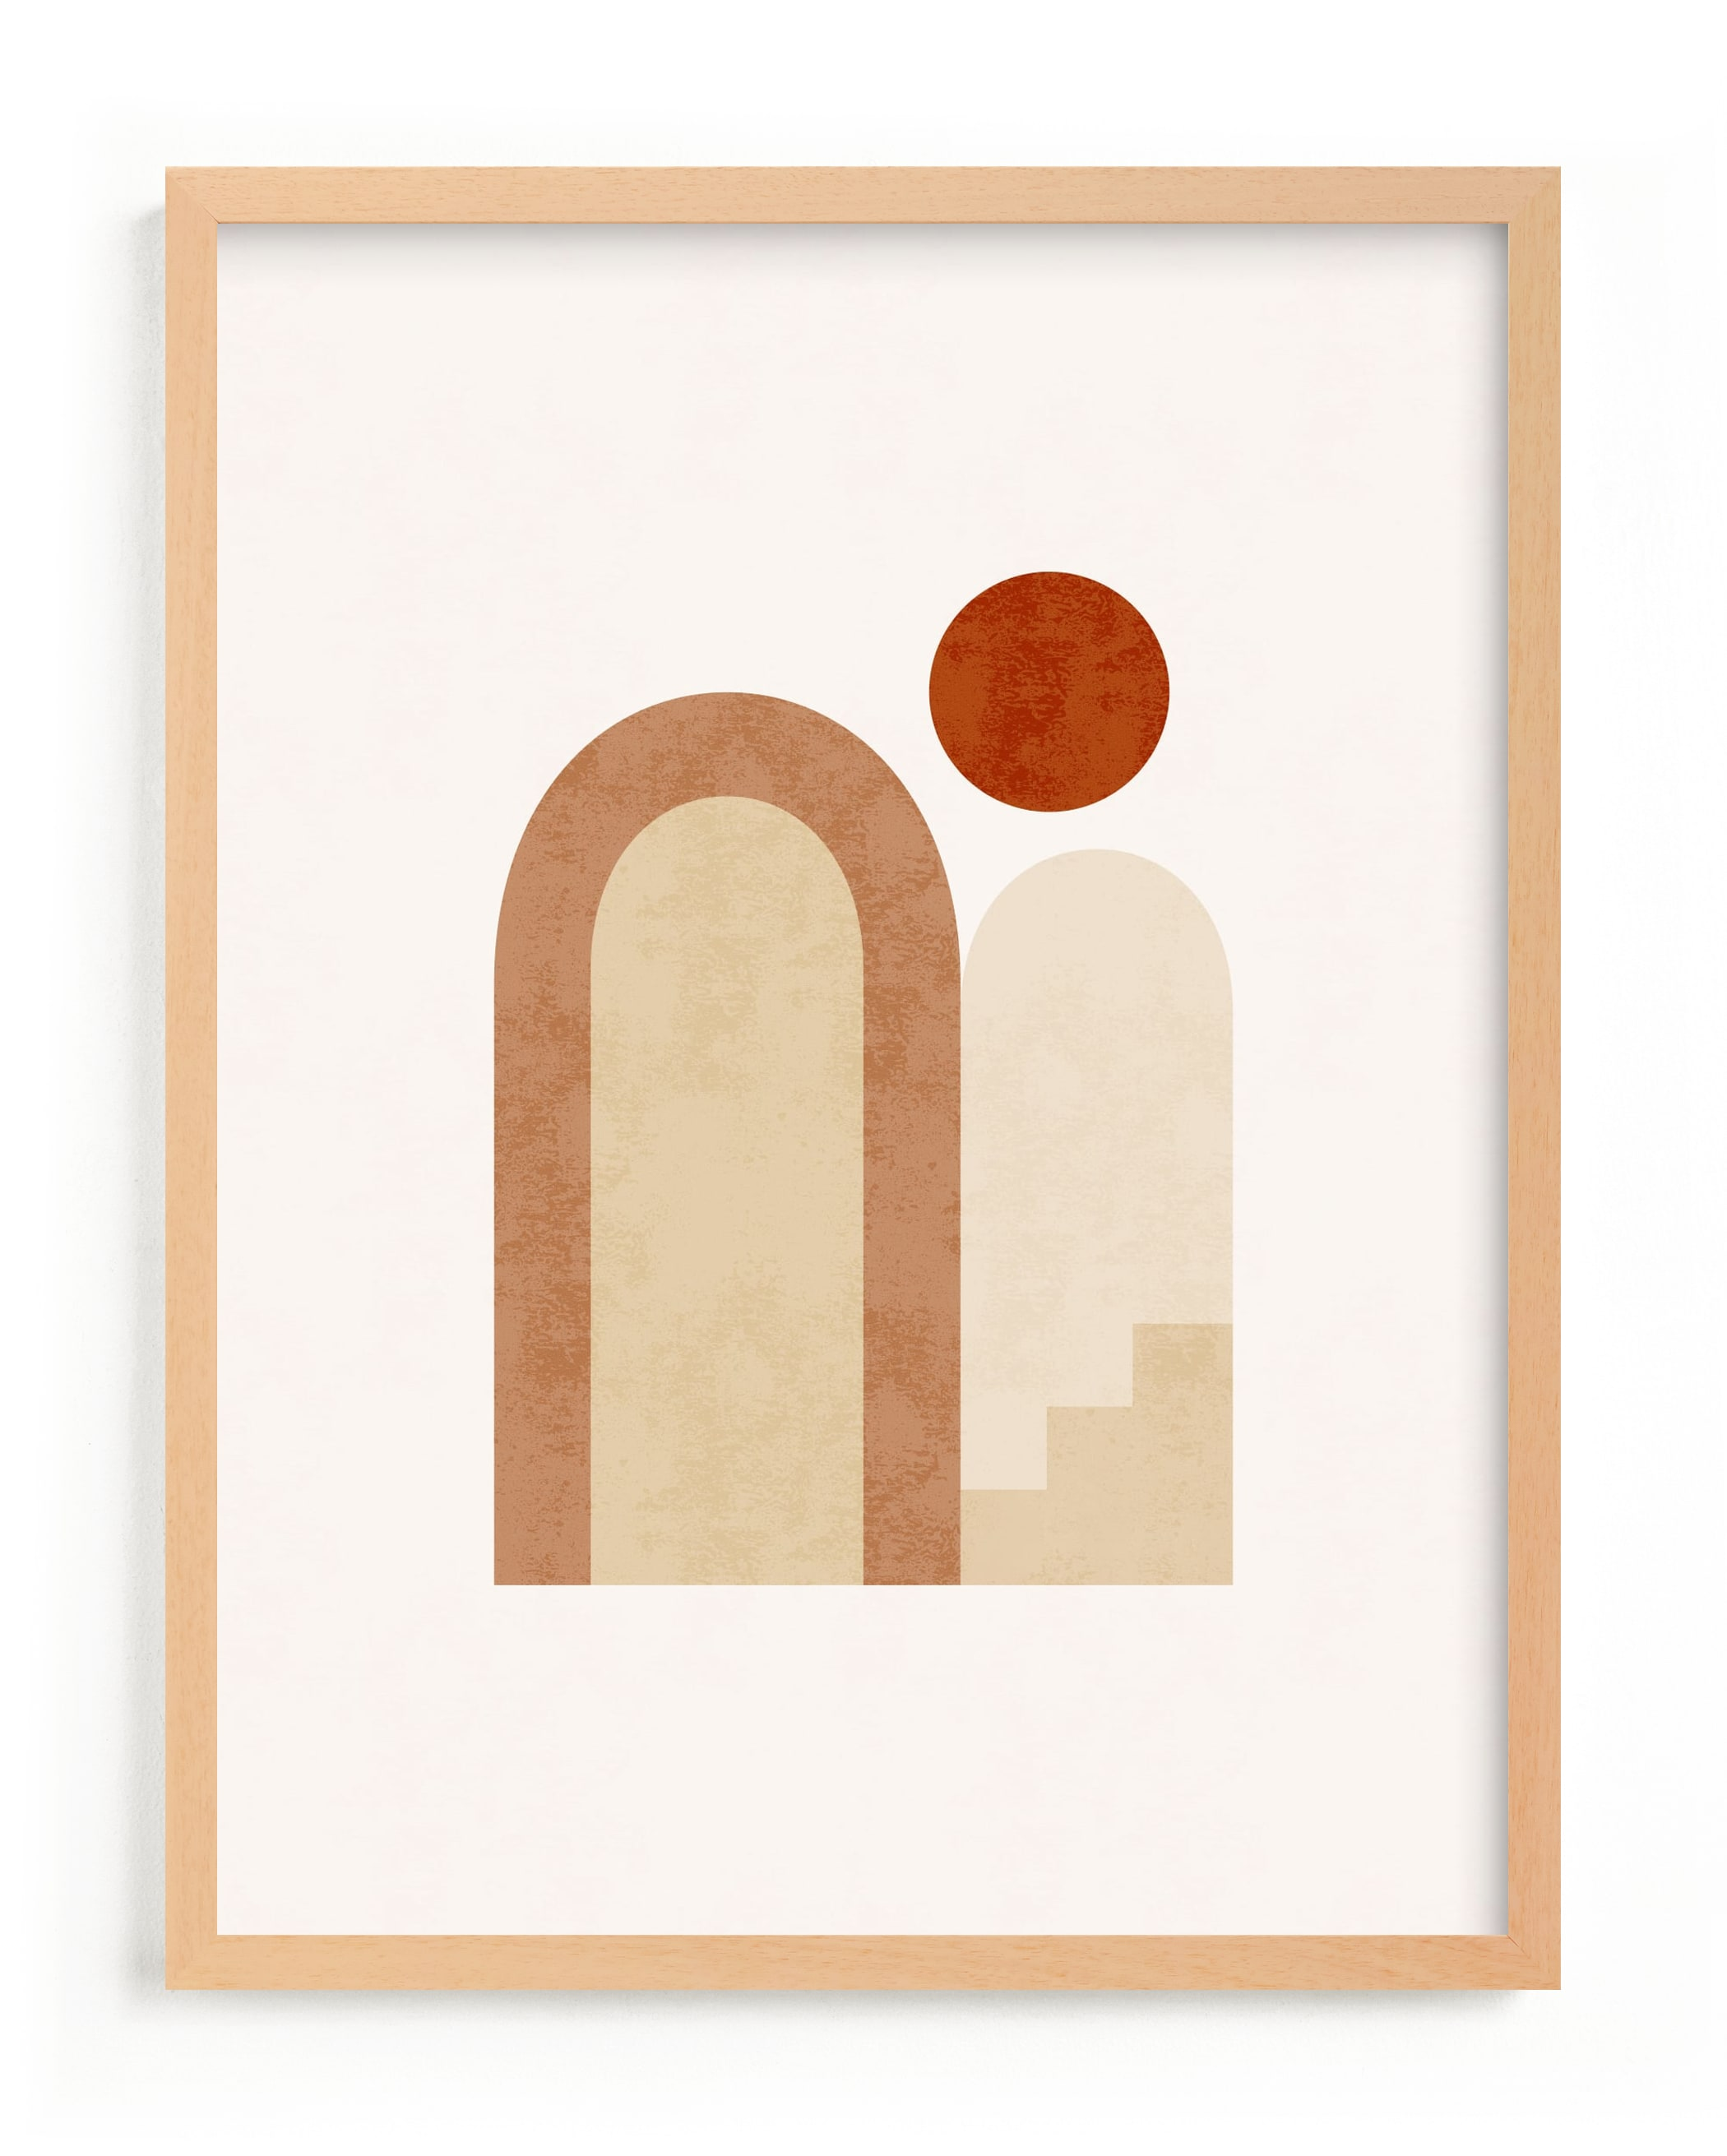 This is a brown art by Iveta Angelova called Rustic Geometry 2.